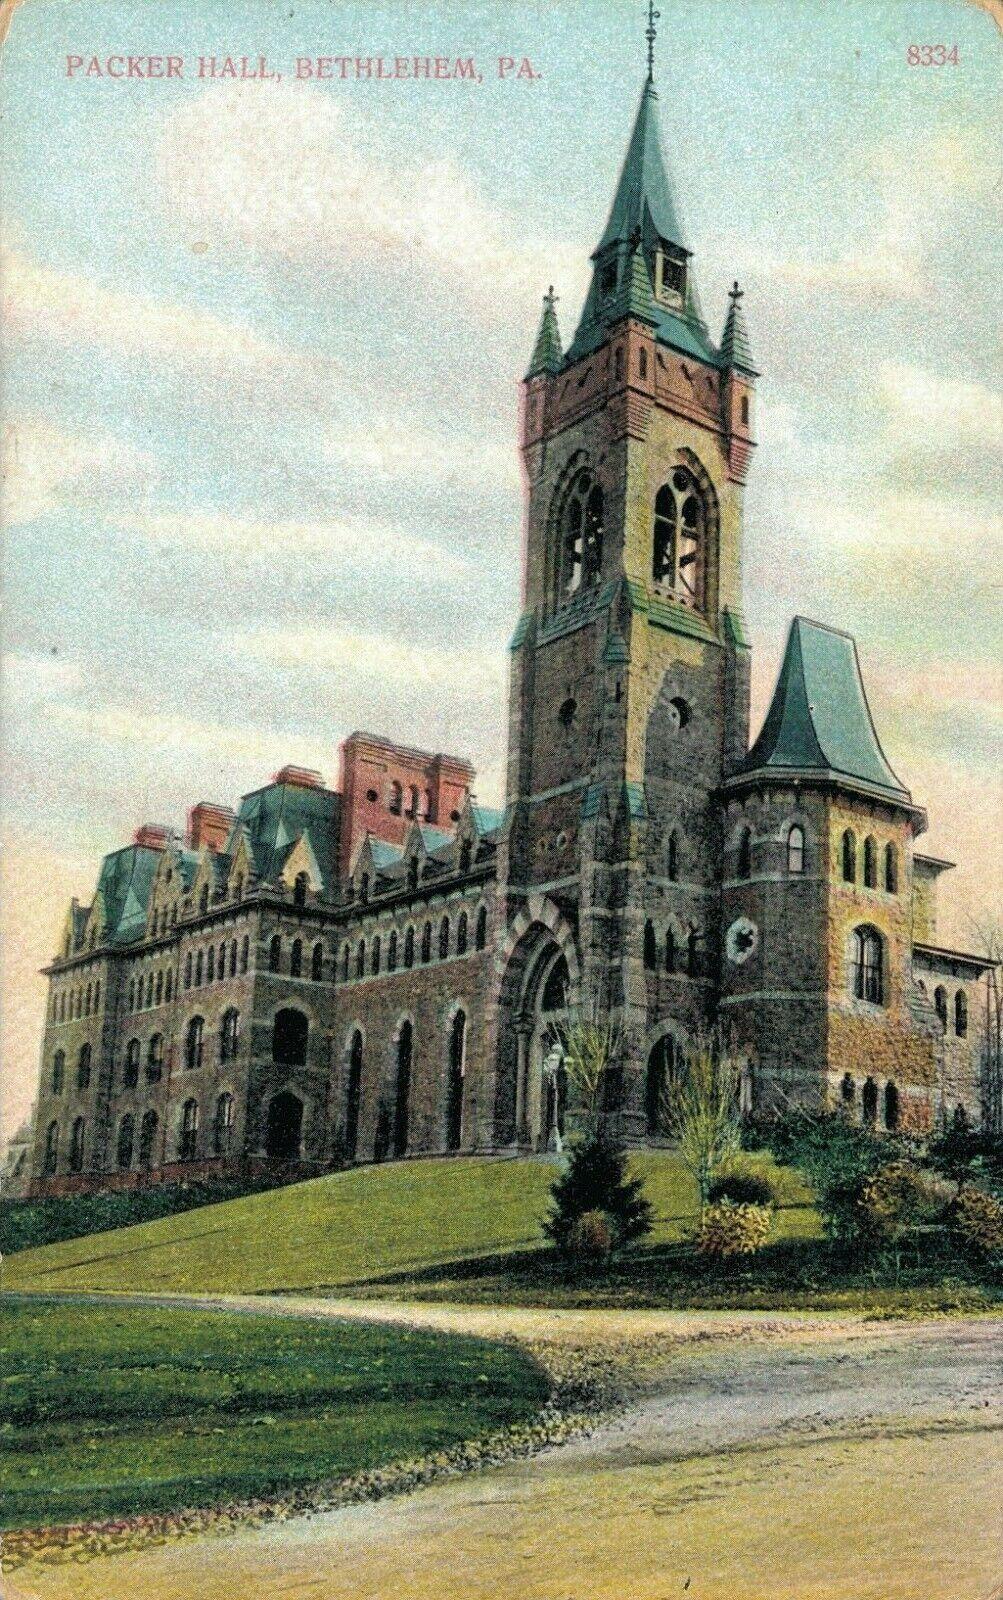 USA Pennsylvania Bethlehem Packer Hall 04.29